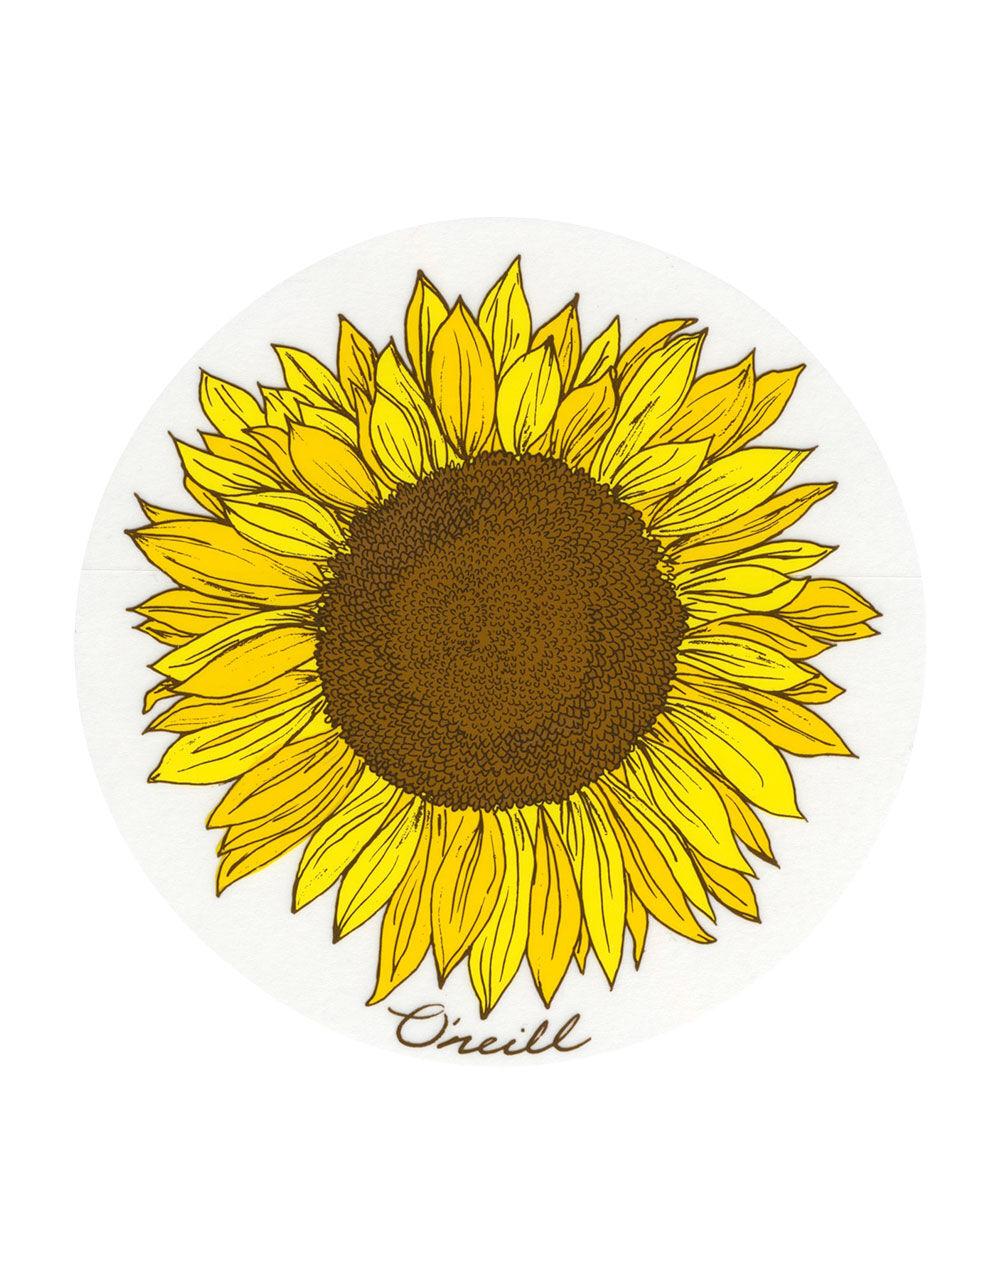 O Neill Sunflower Sticker 268560900 Stickers